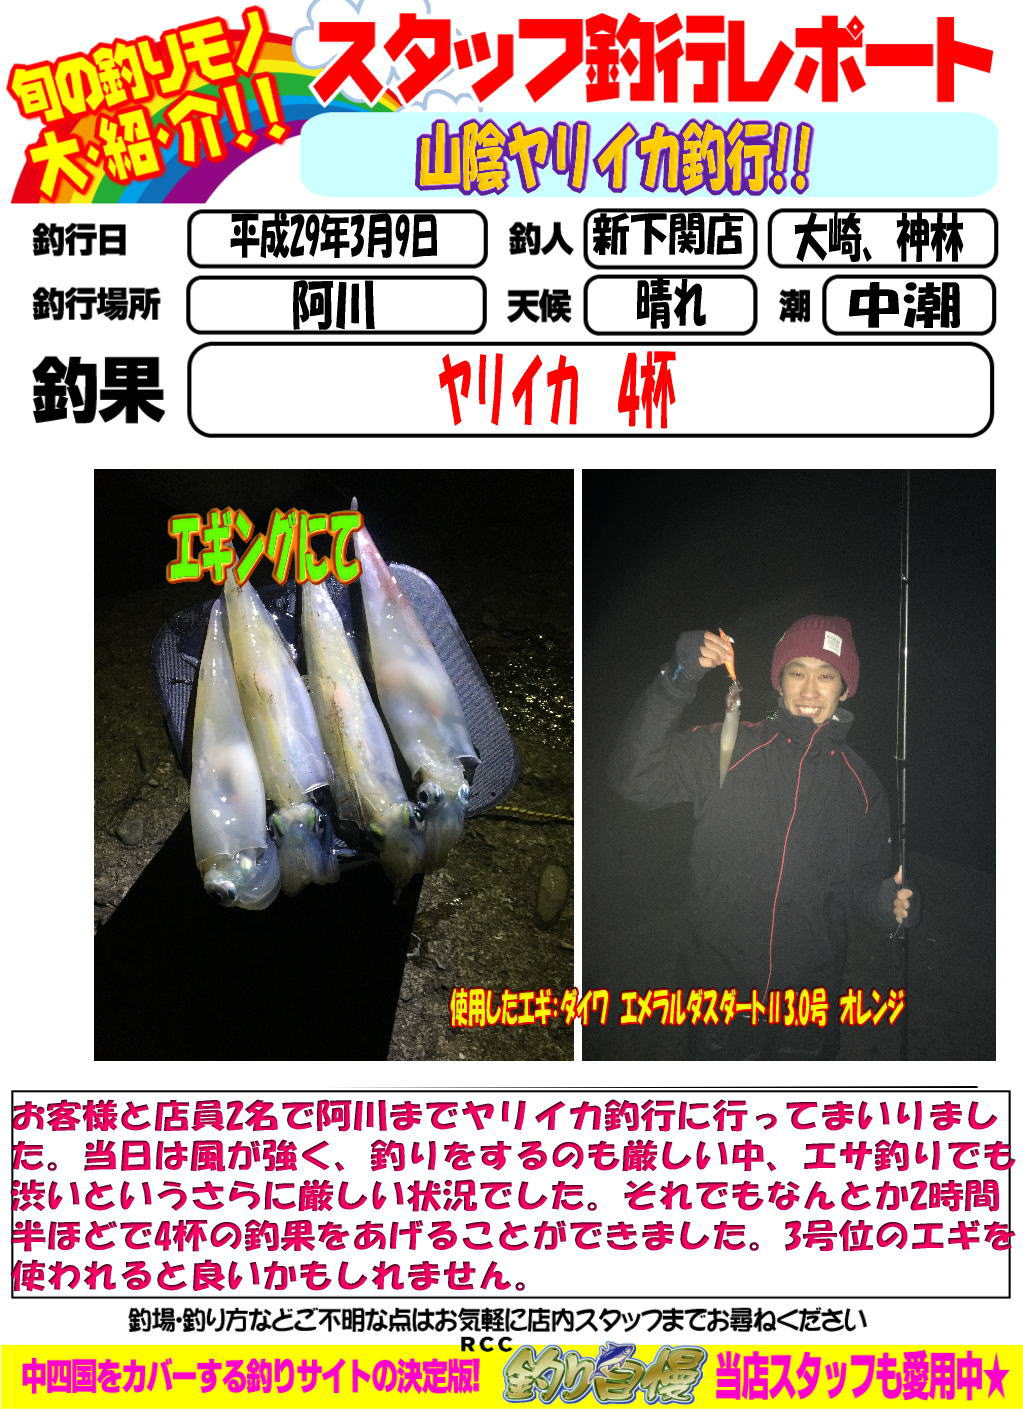 http://www.e-angle.co.jp/shop/blog/blog-20170309-sinsimo-kanbayasi.jpg